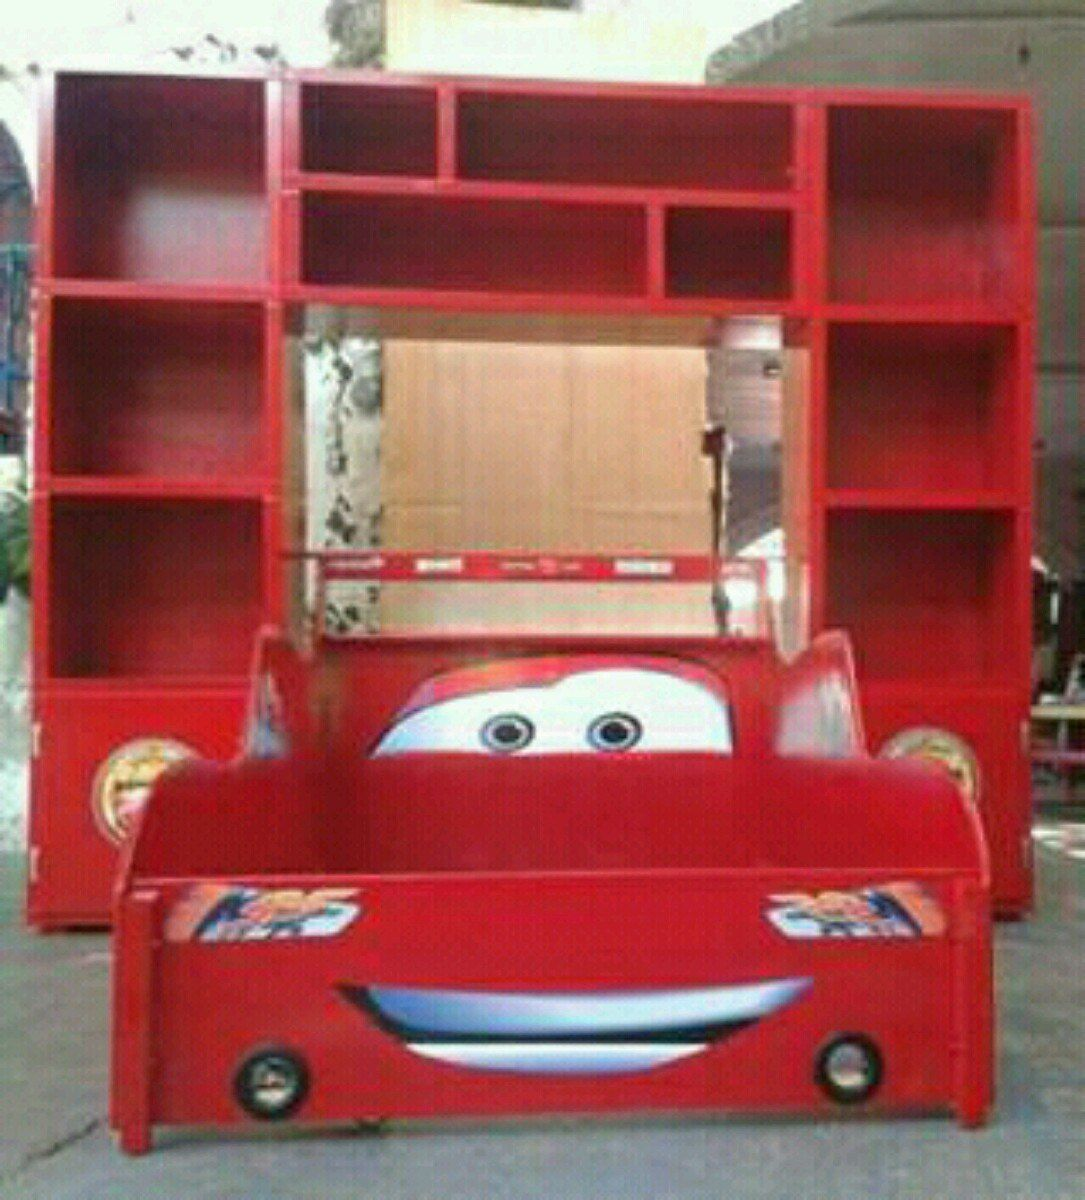 Cama rayo mcqueen cama carro cars recamara infantil for Cama sandwich